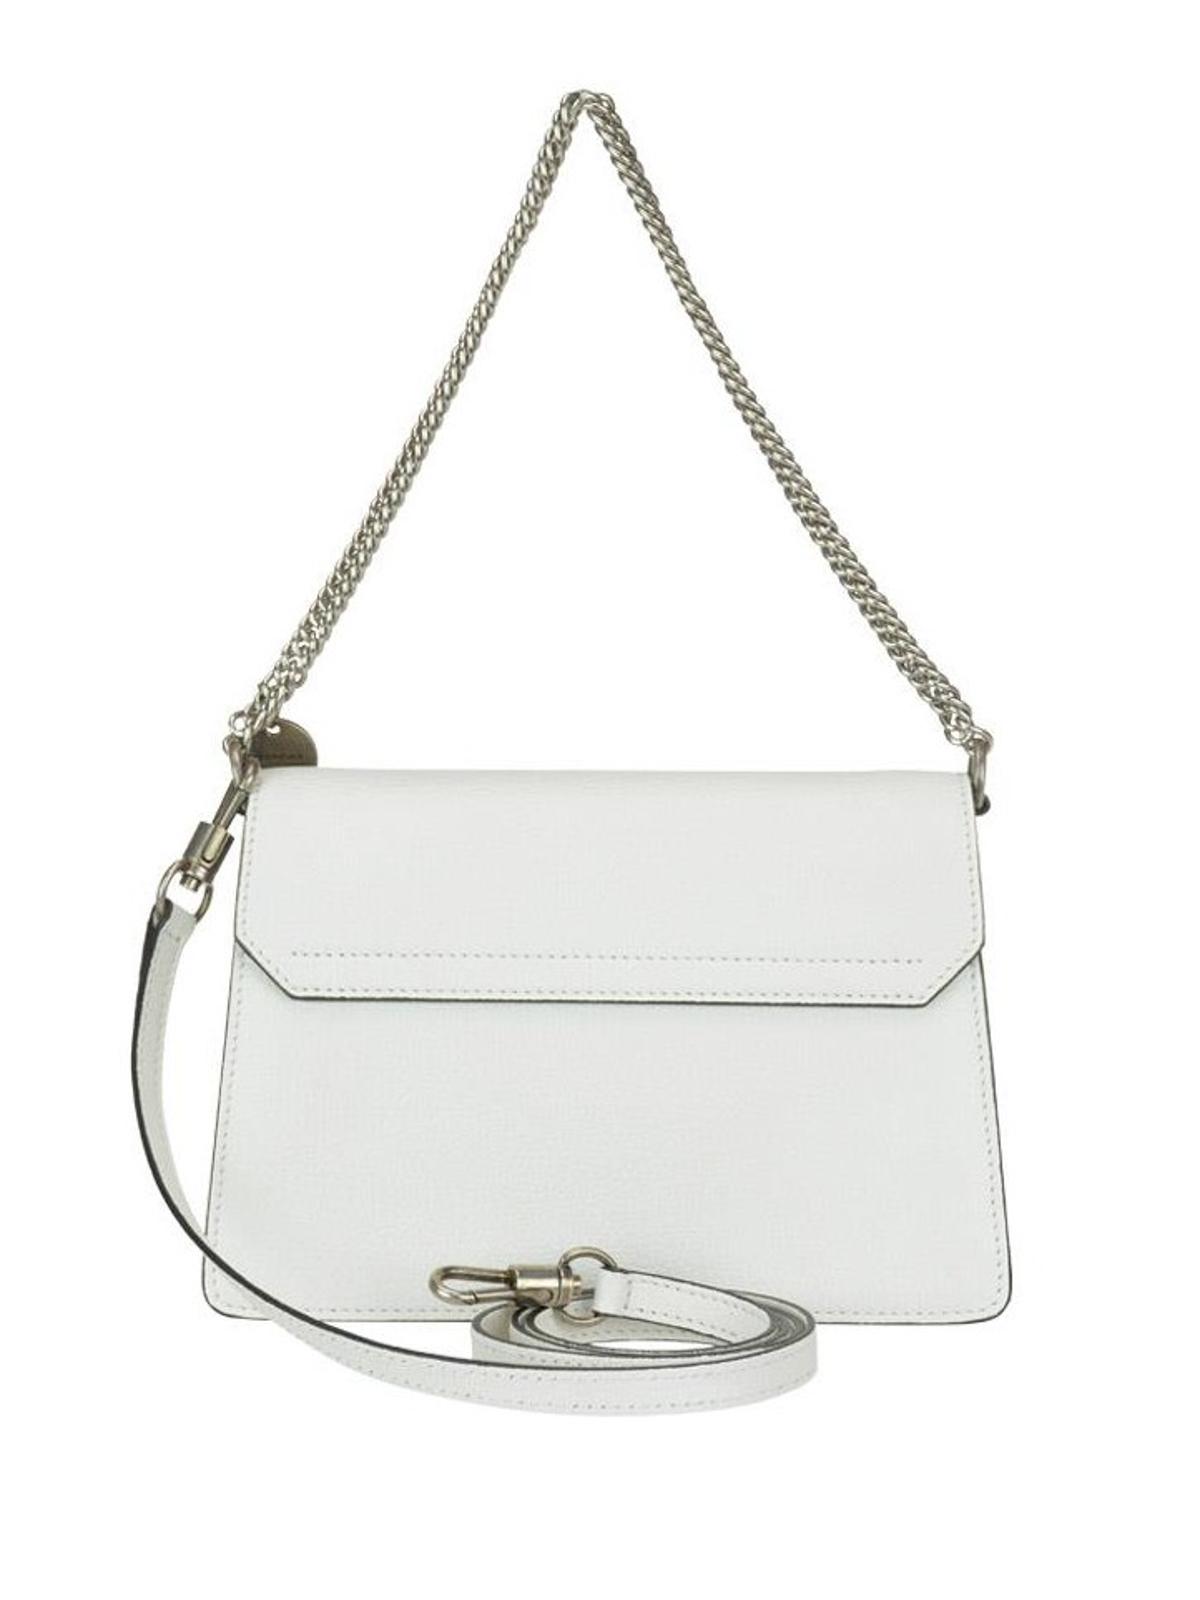 iKRIX GIVENCHY  cross body bags - GV3 white grainy leather small cross body  bag 5ba539b4ec372